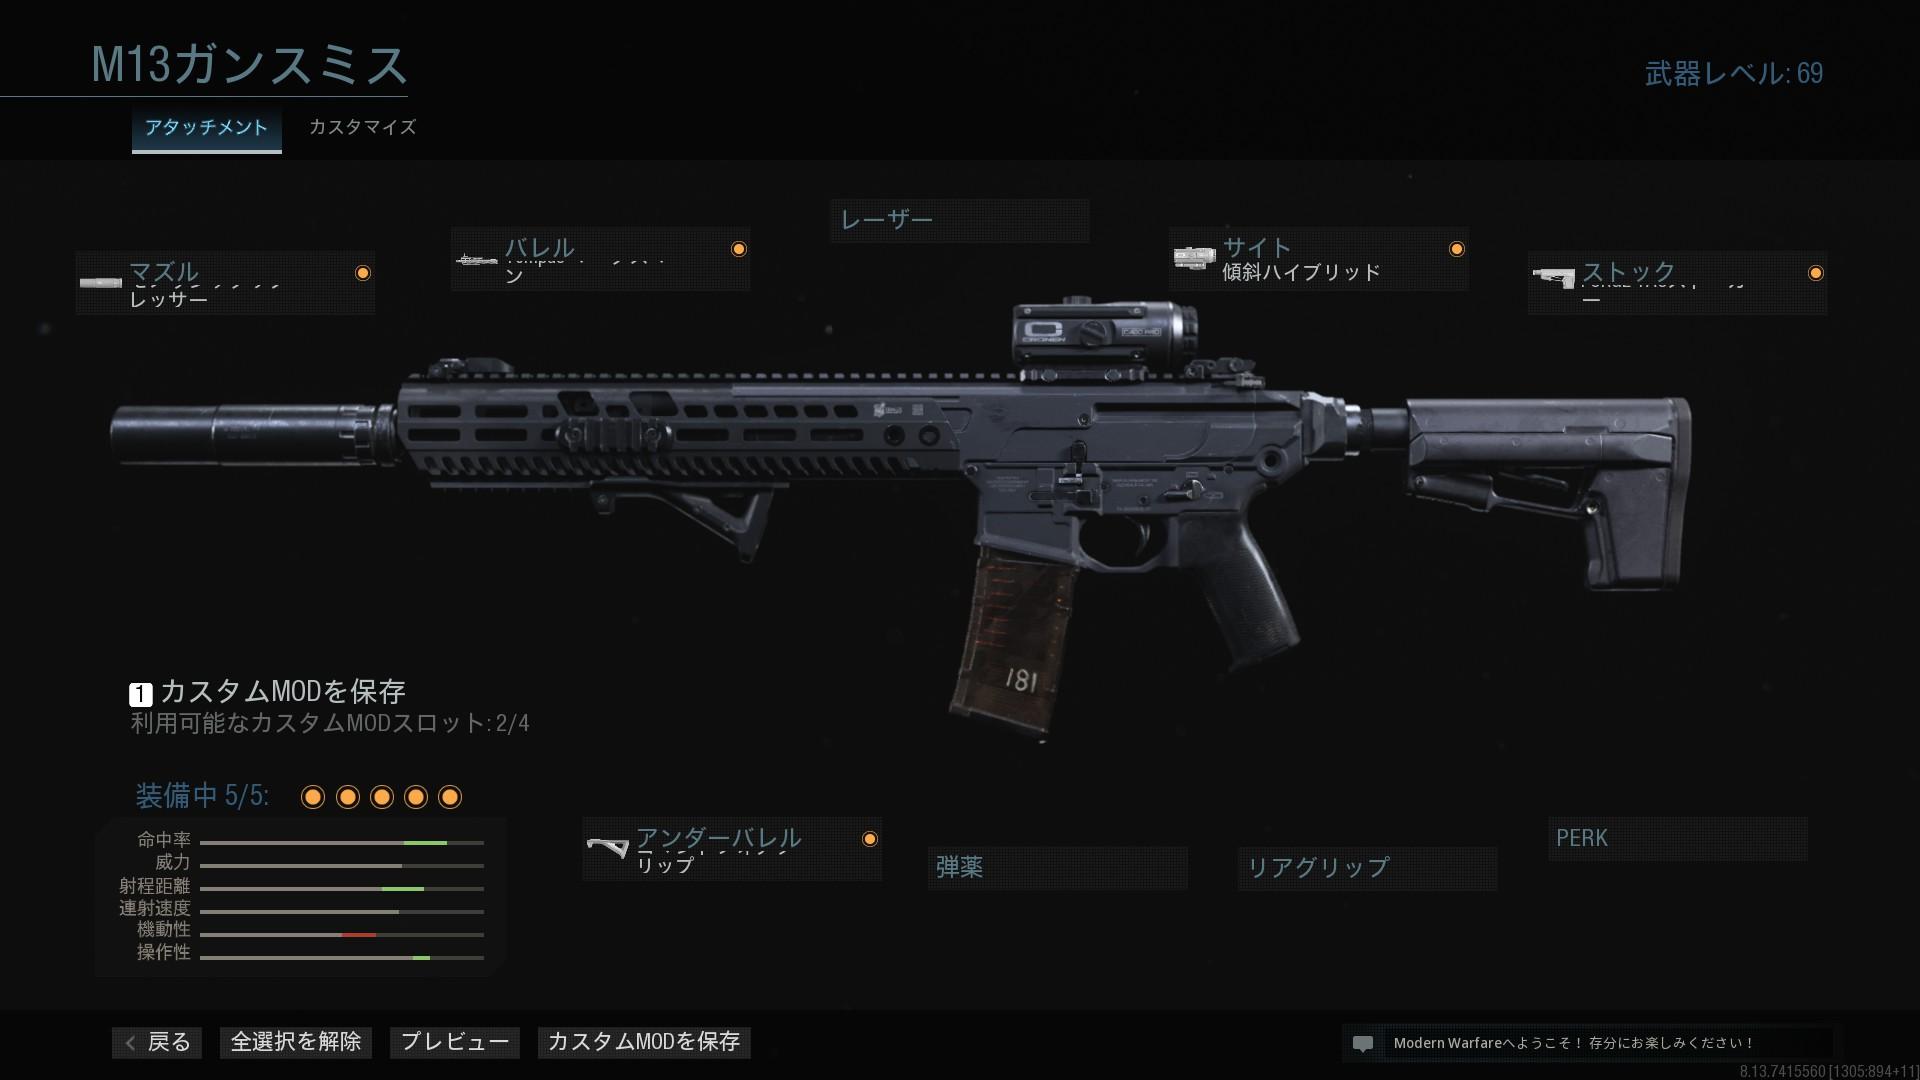 M13Long.jpg